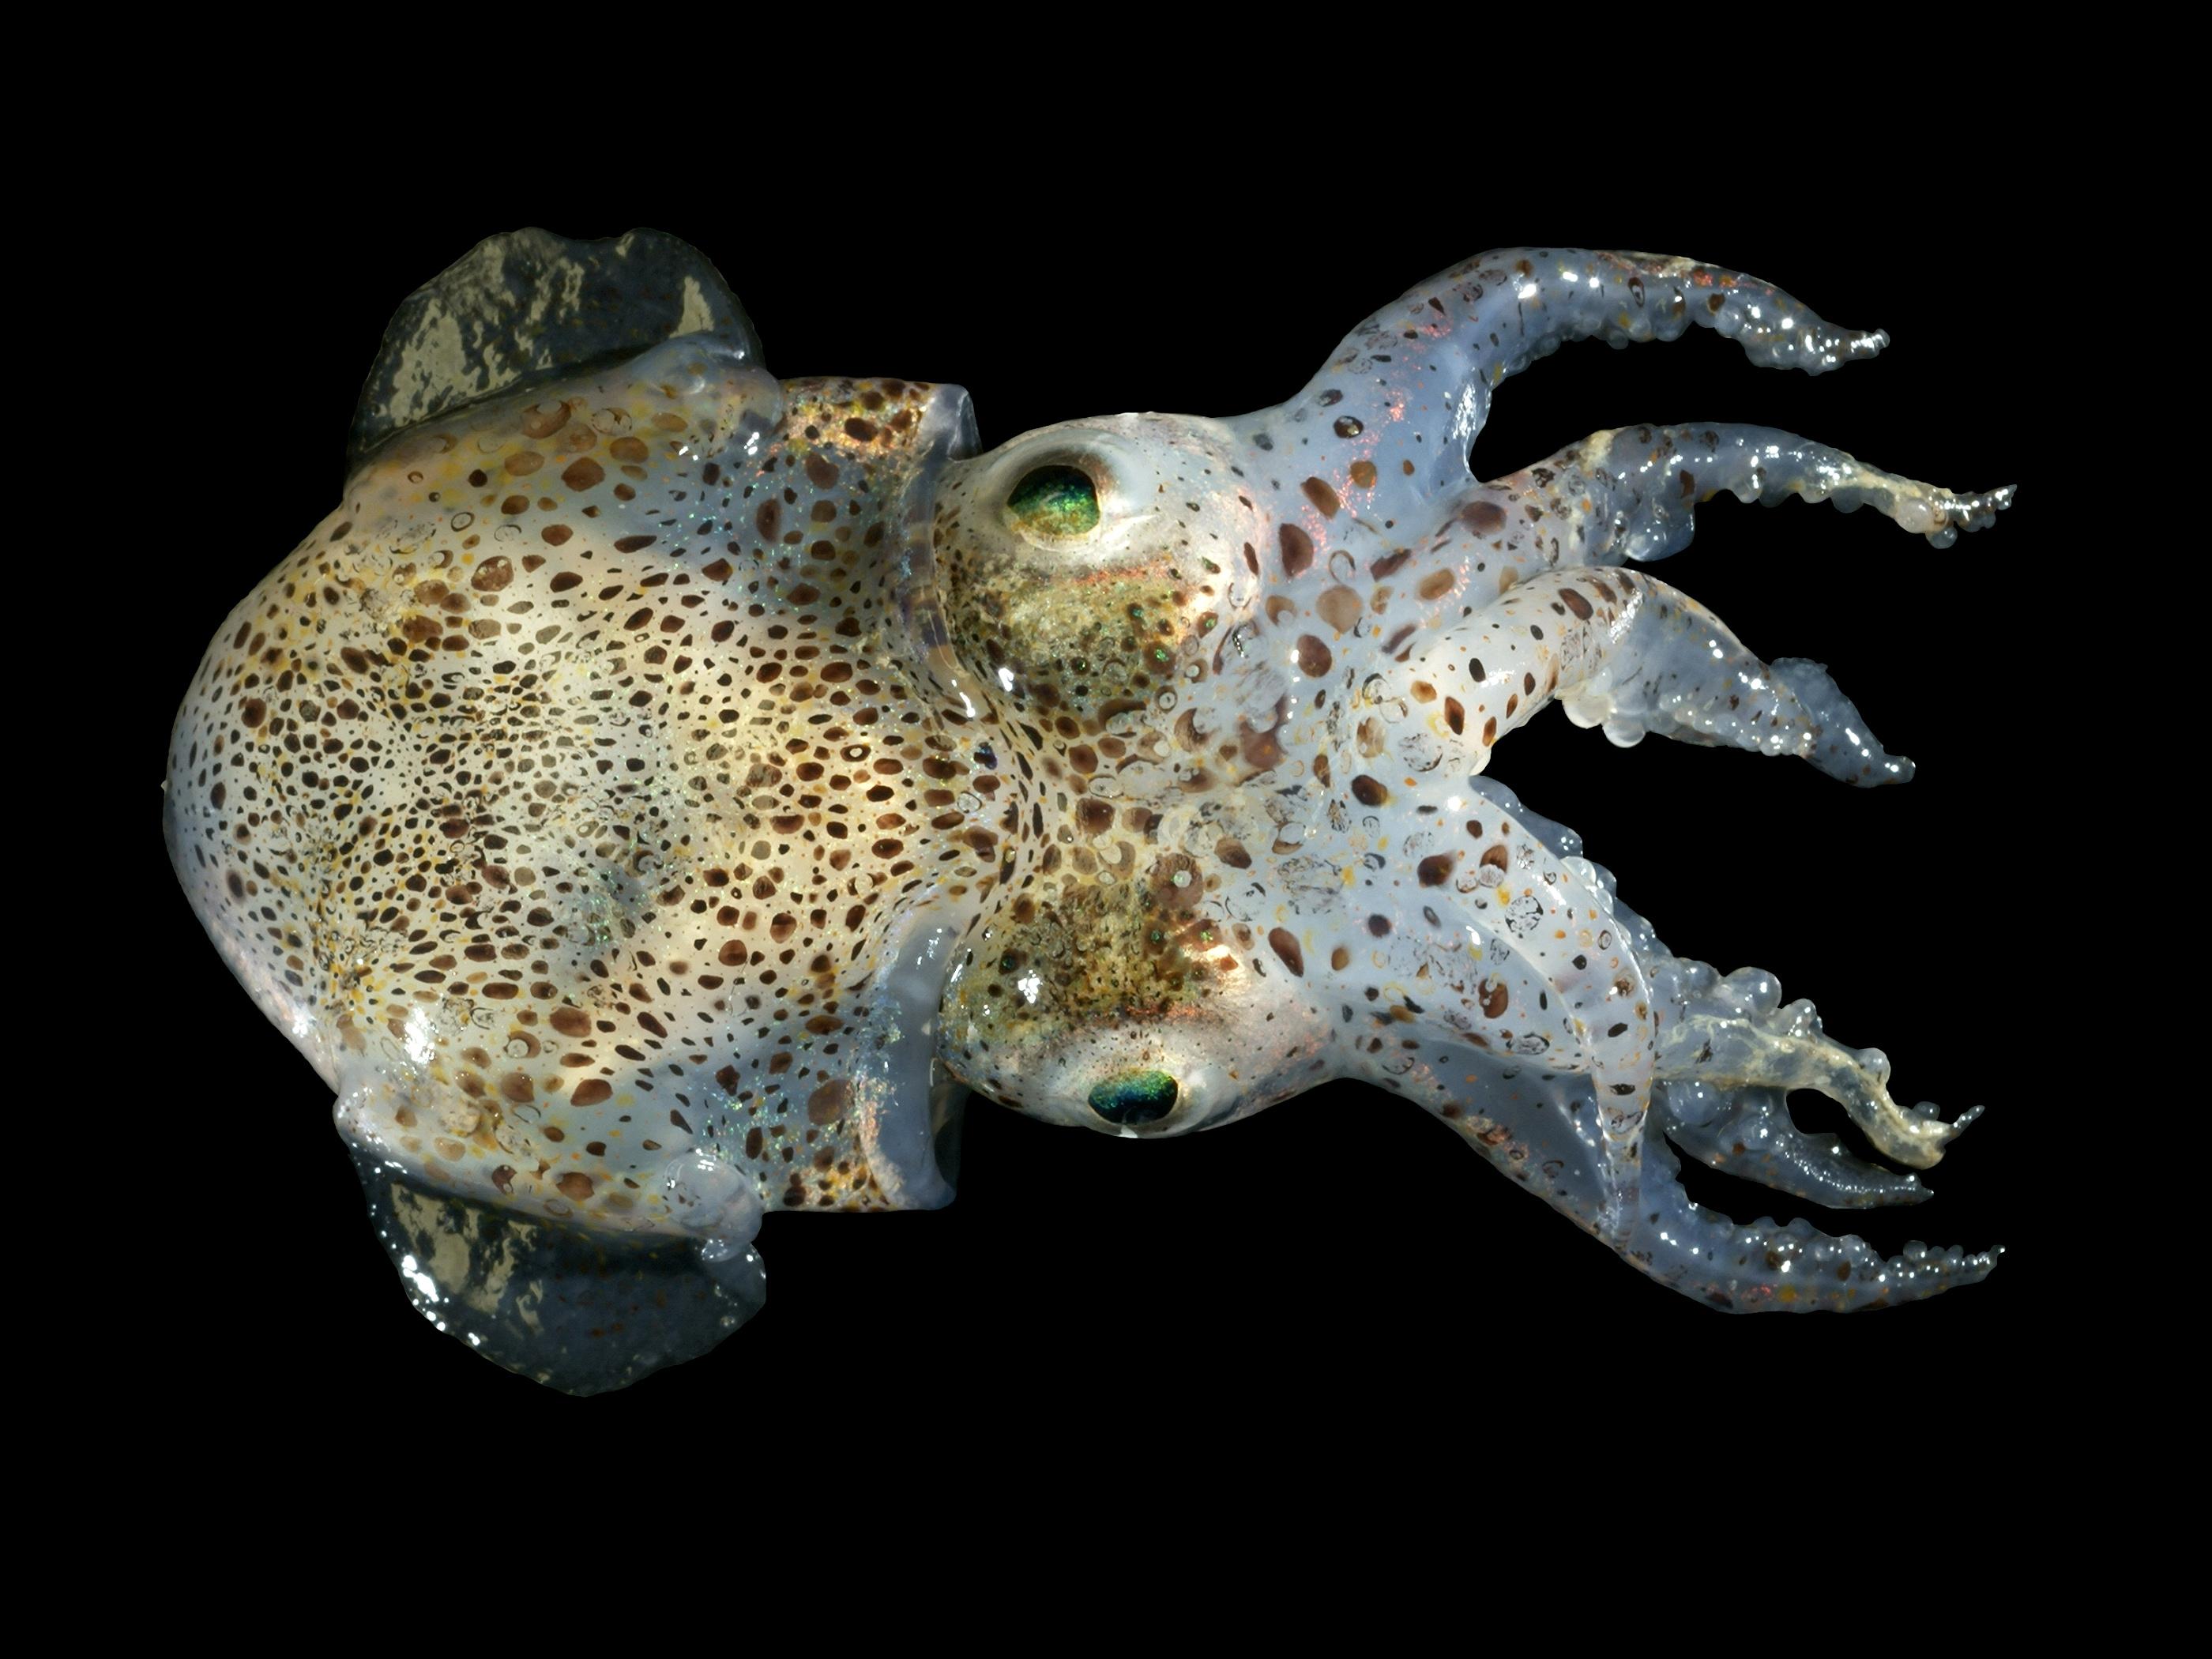 Cephalopod - Wikipedia